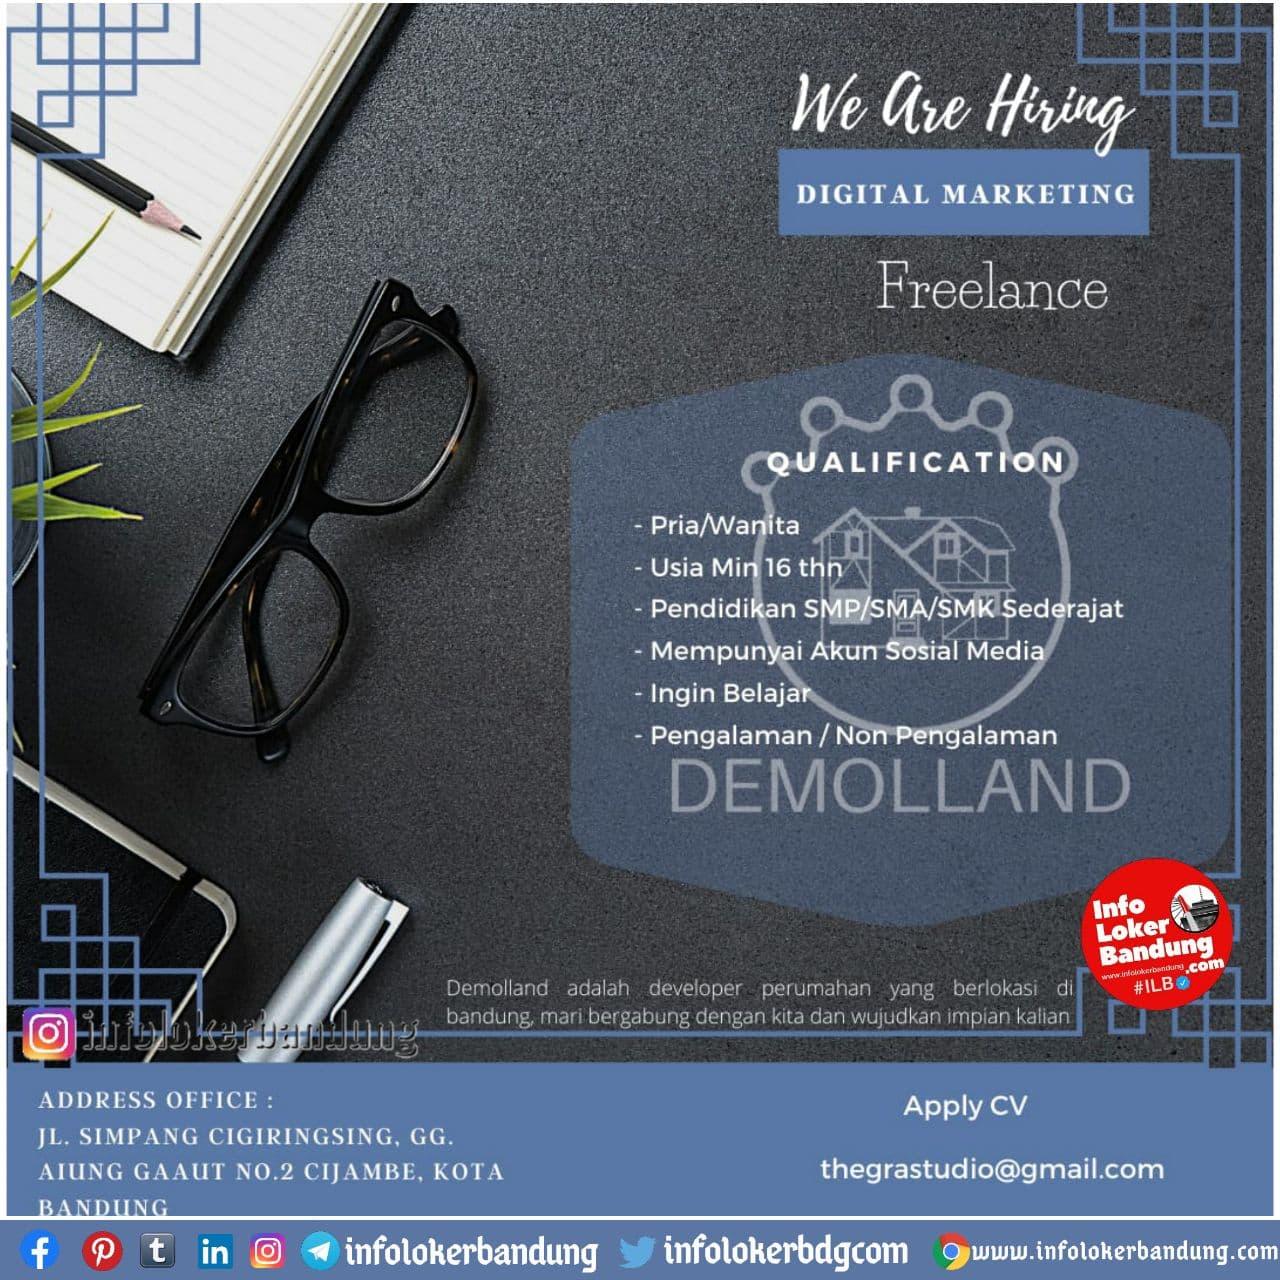 Lowongan Kerja Digital Marketing ( Freelance ) Demolland Bandung Desember 2020